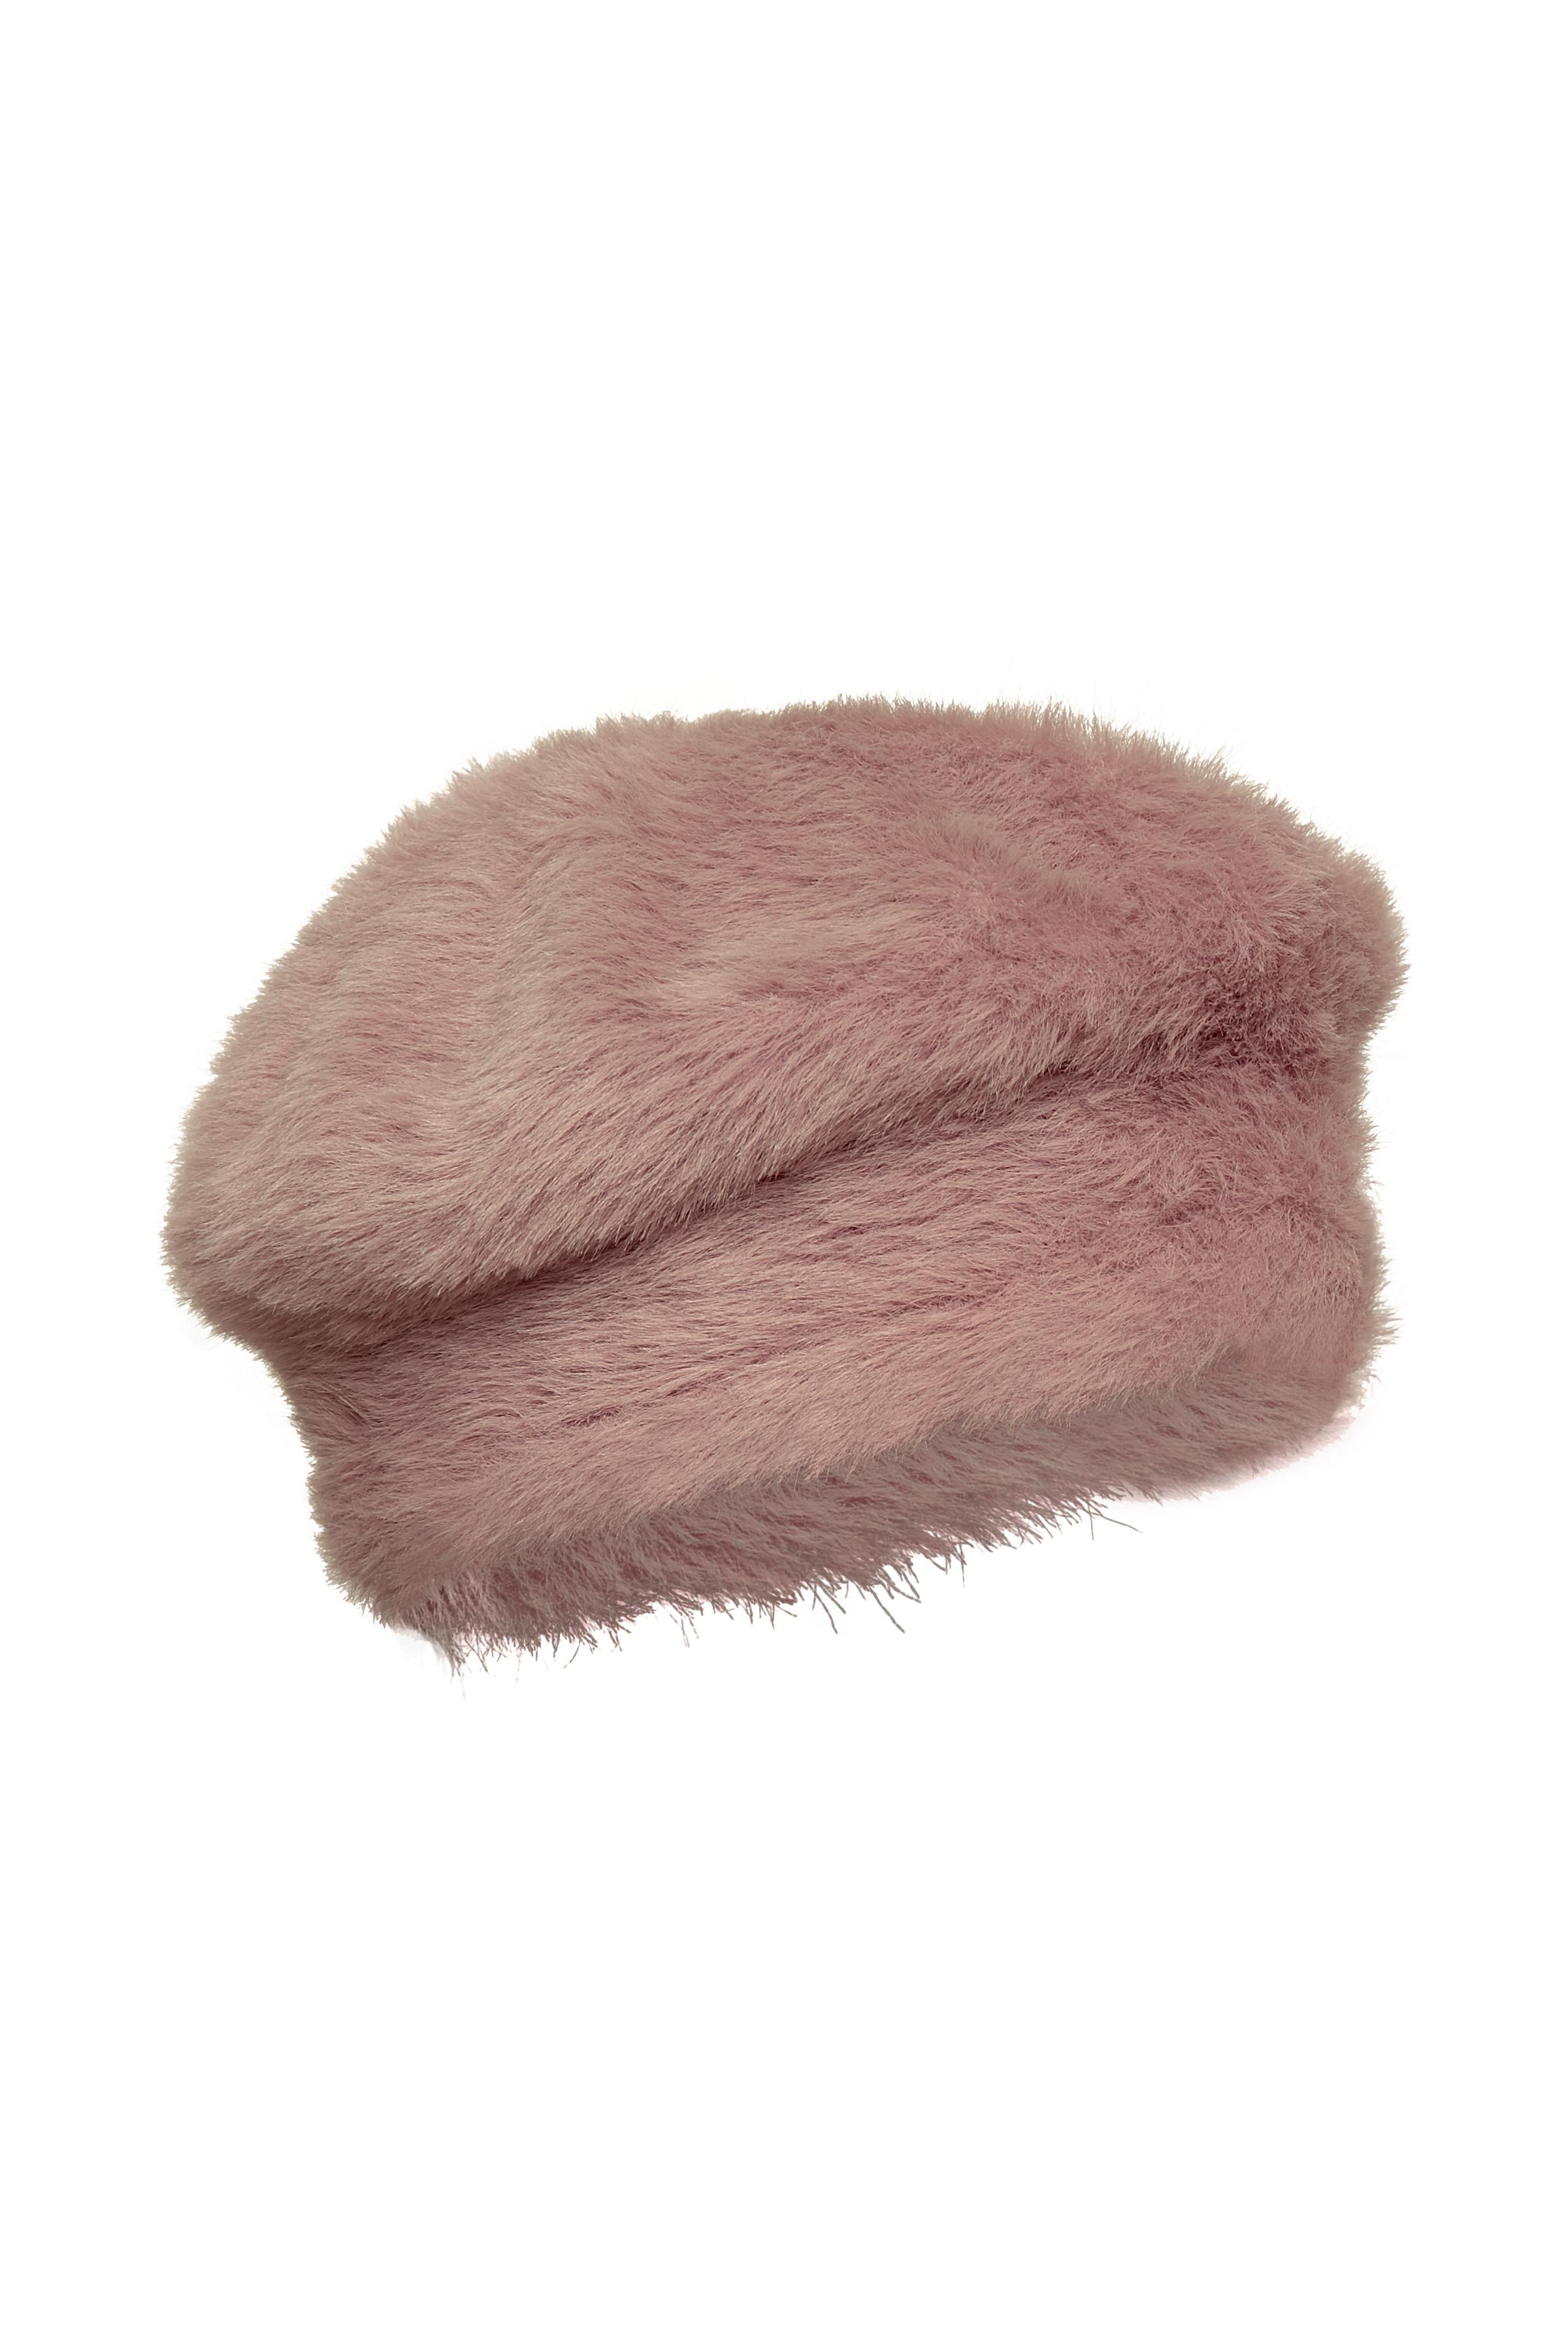 Støvet rosa Hue fra Ichi - accessories – Køb Støvet rosa Hue fra str. ONE her